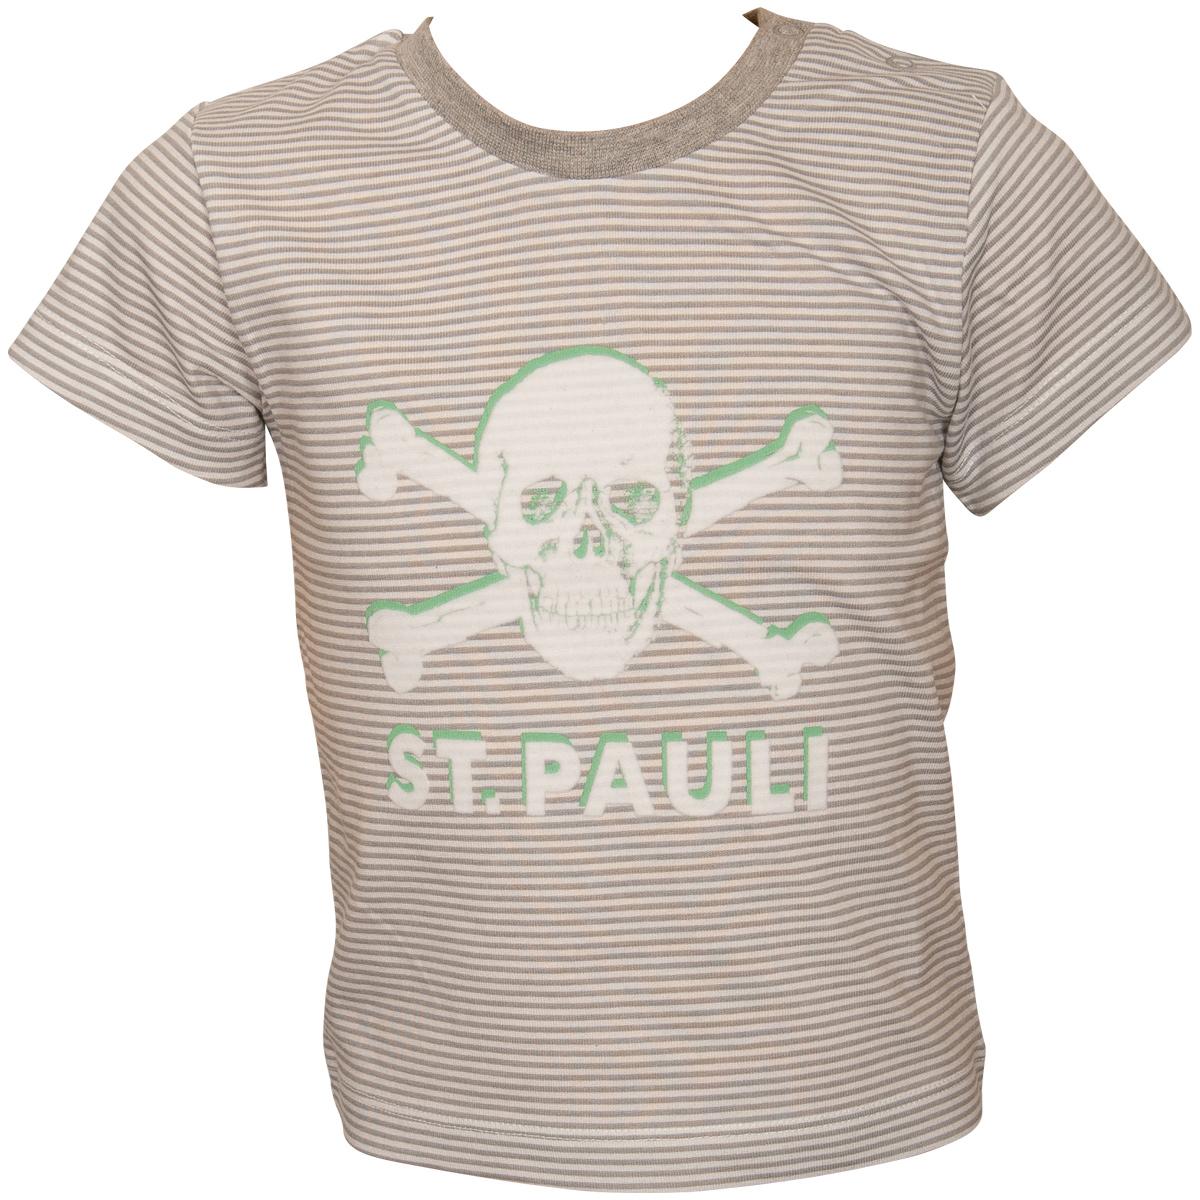 FC St. Pauli - Baby T-Shirt Totenkopf - Grau Weiß Gestreift